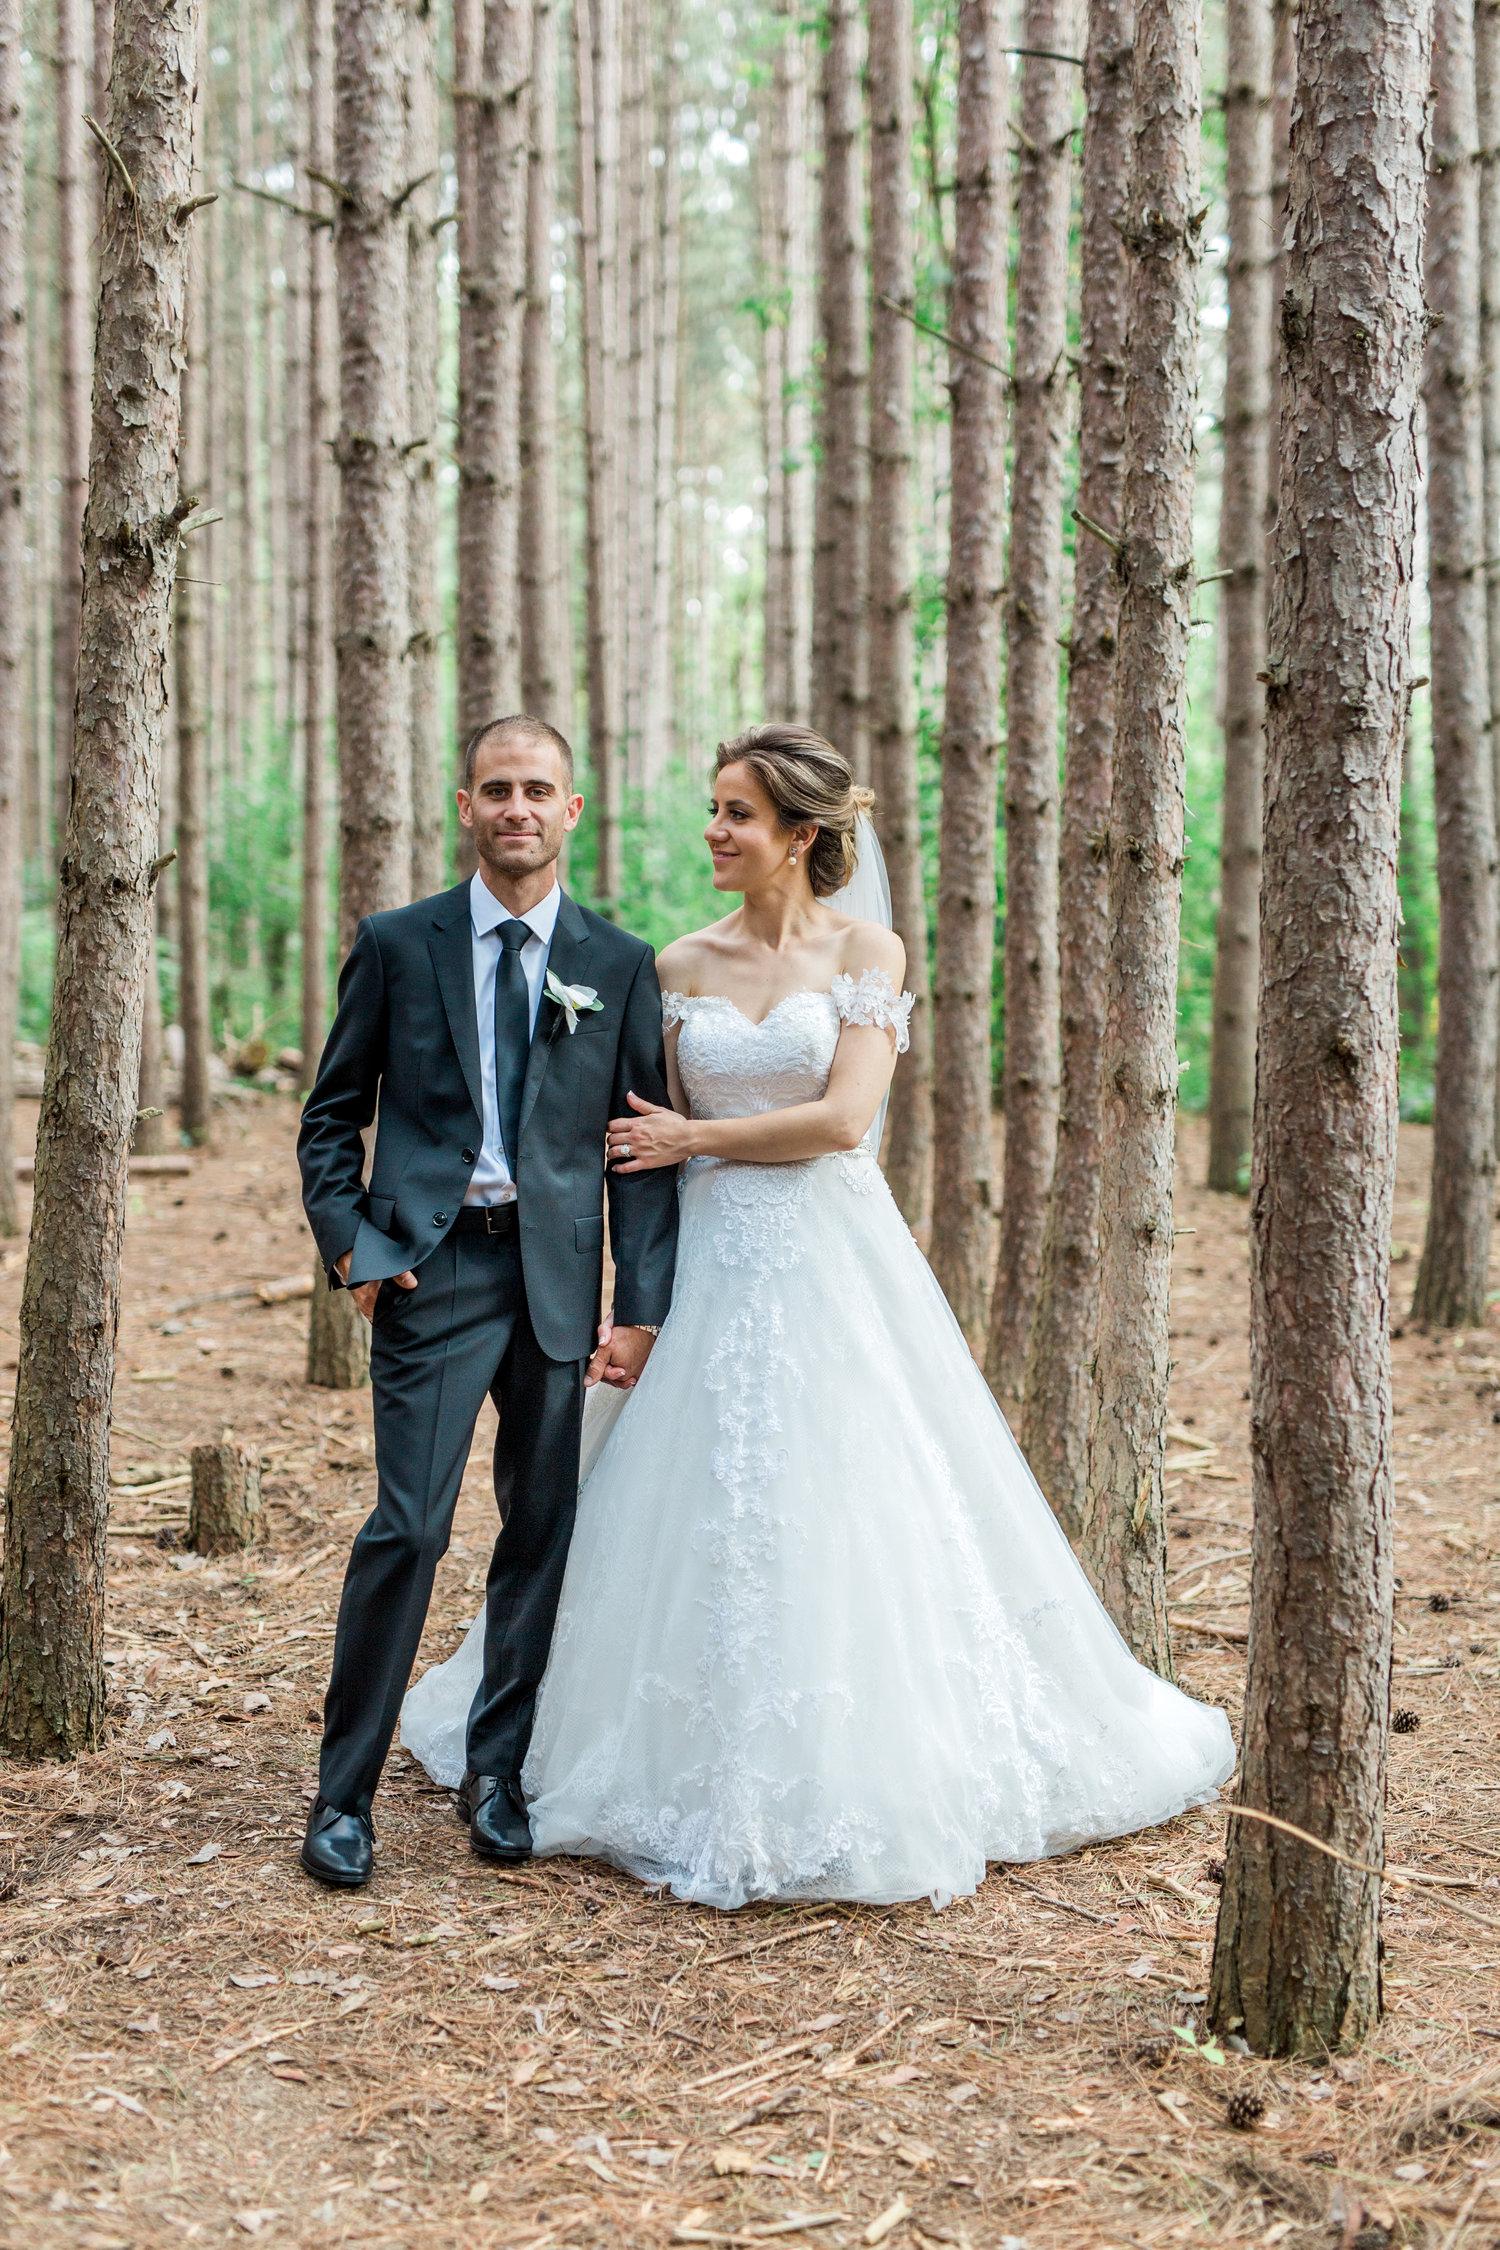 Danielle-Giroux-Amir-Golbazi-Toronto-Wedding-Photographer-Bellvue-Manor_DeLuca_1-862.jpg